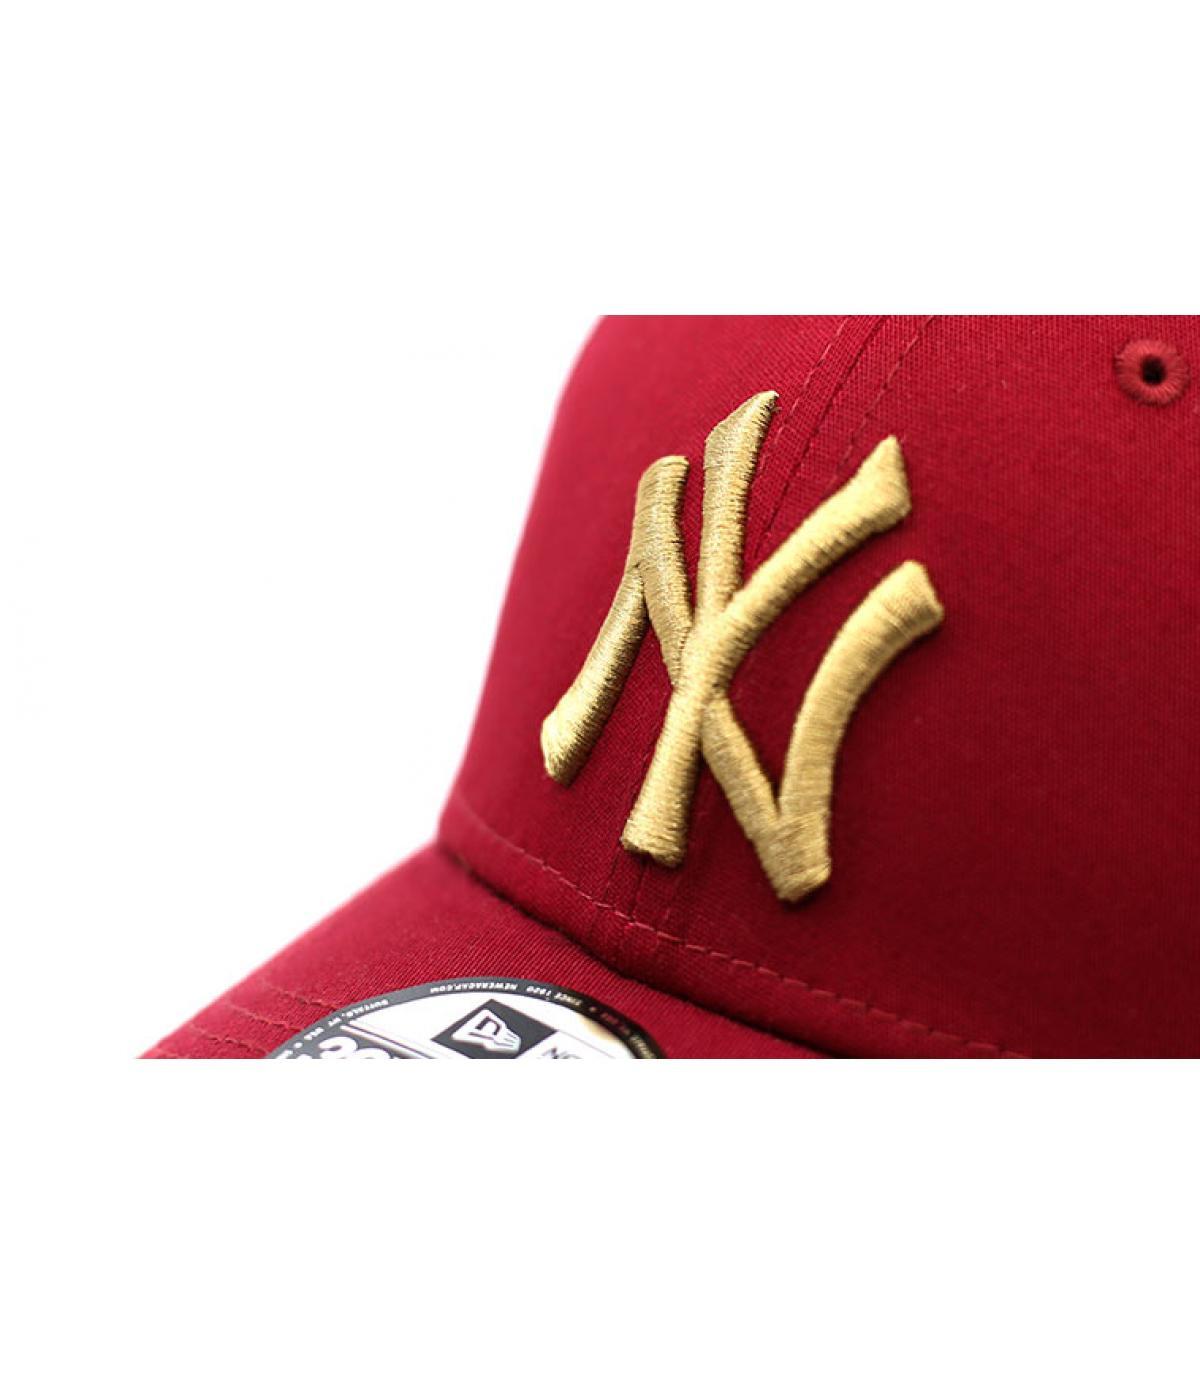 Dettagli League Ess NY 3930 cardinal wheat - image 3